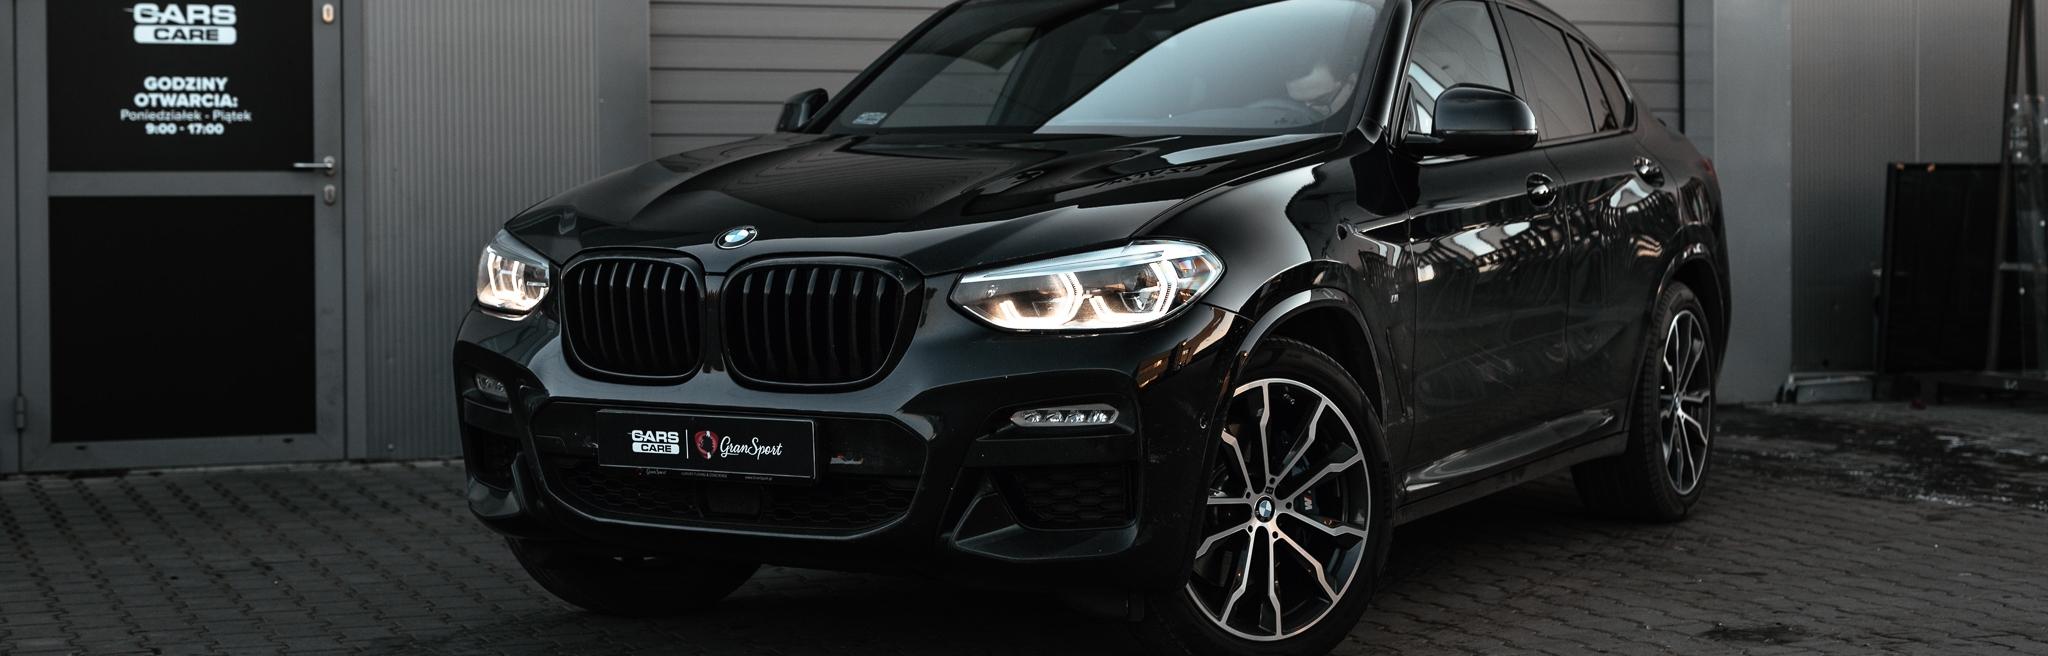 BMW X4 G02 Maxhaust